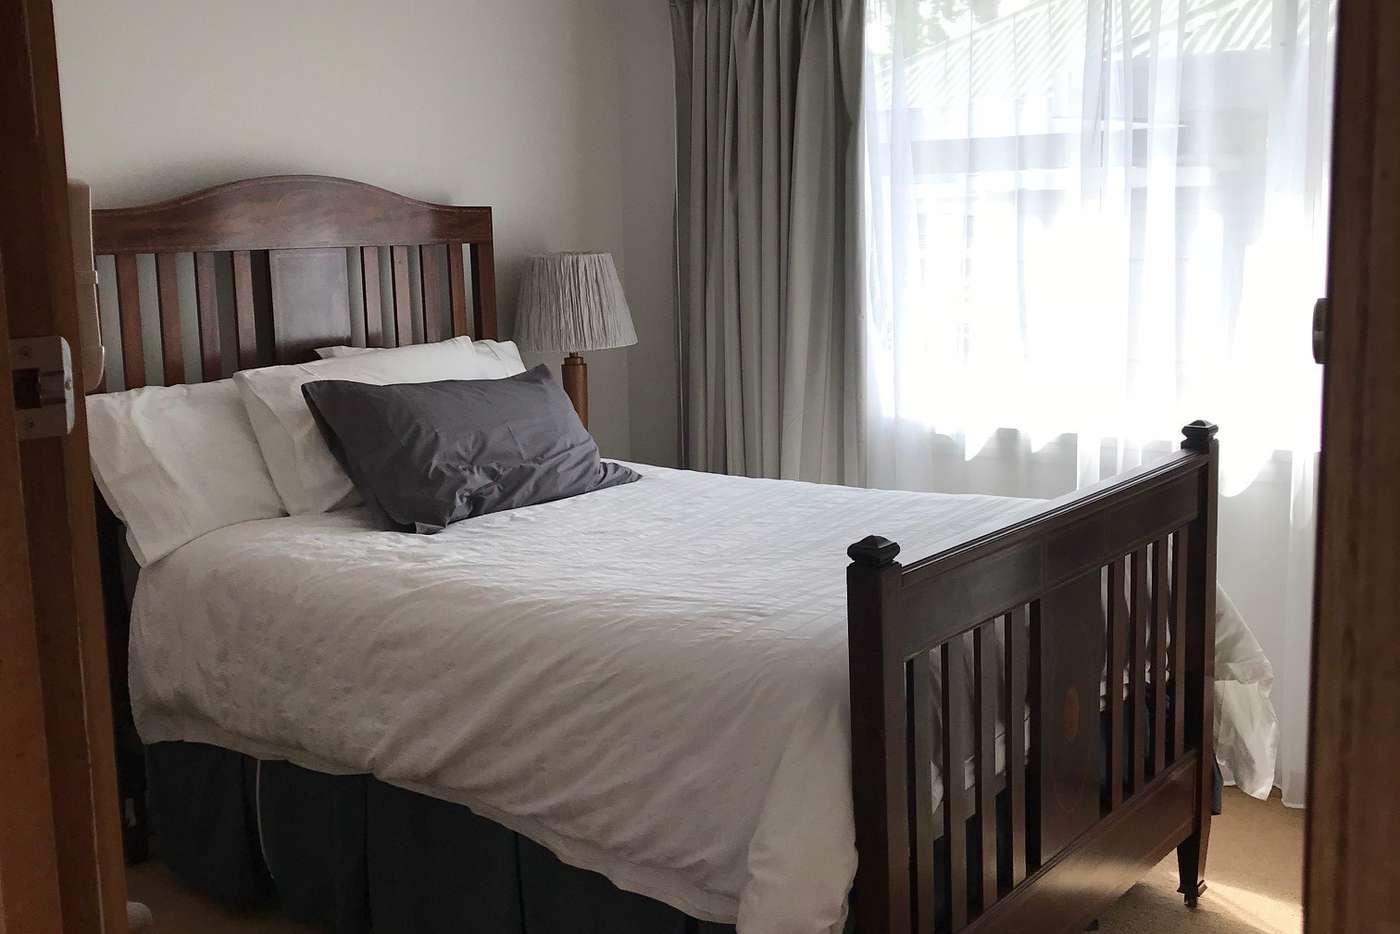 Seventh view of Homely house listing, 22 Neika Avenue, West Launceston TAS 7250